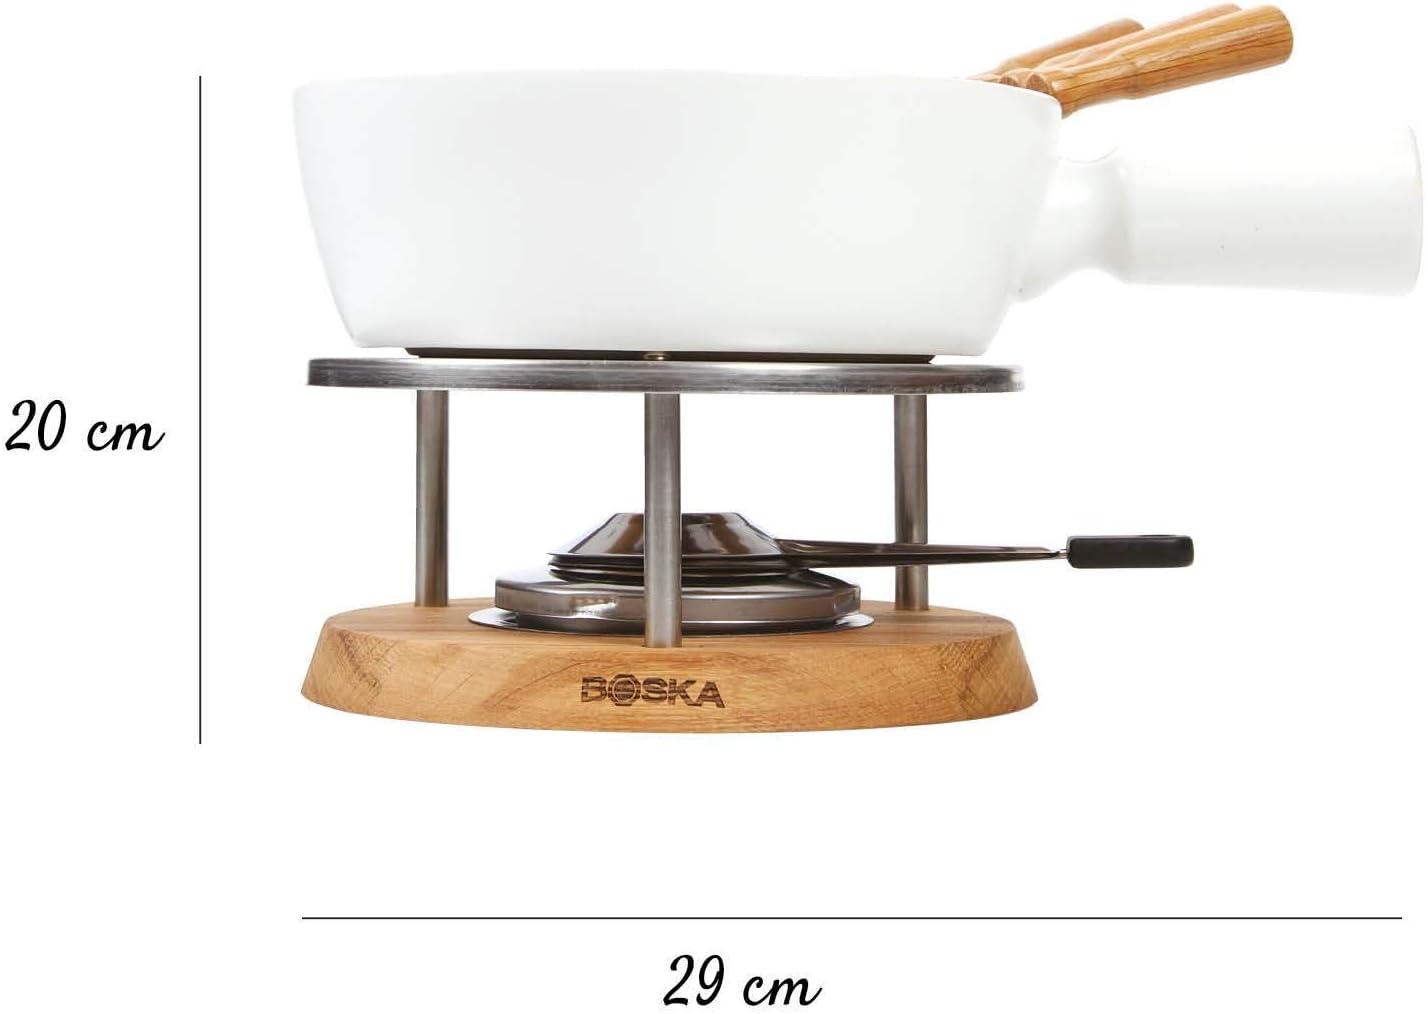 Acier BOSKA 340031 Life Twinkle Set Fondue Fromage Blanc 24 x 24 x 15 cm